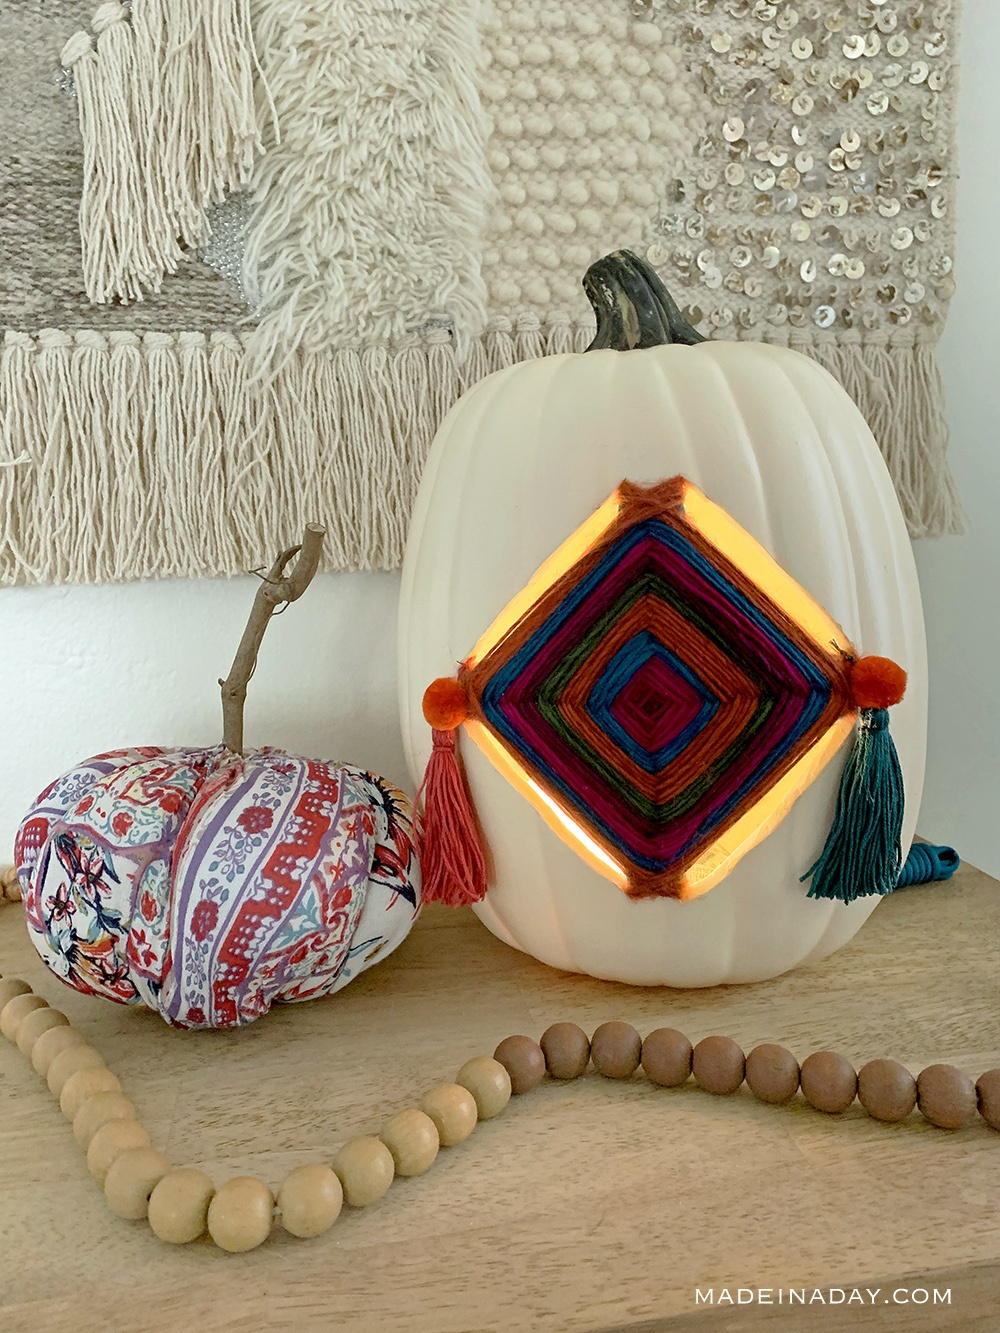 Gods Eye Pumpkin Lantern Luminaries, Boho Tassel Pumpkin, Yarn Stitched pumpkin